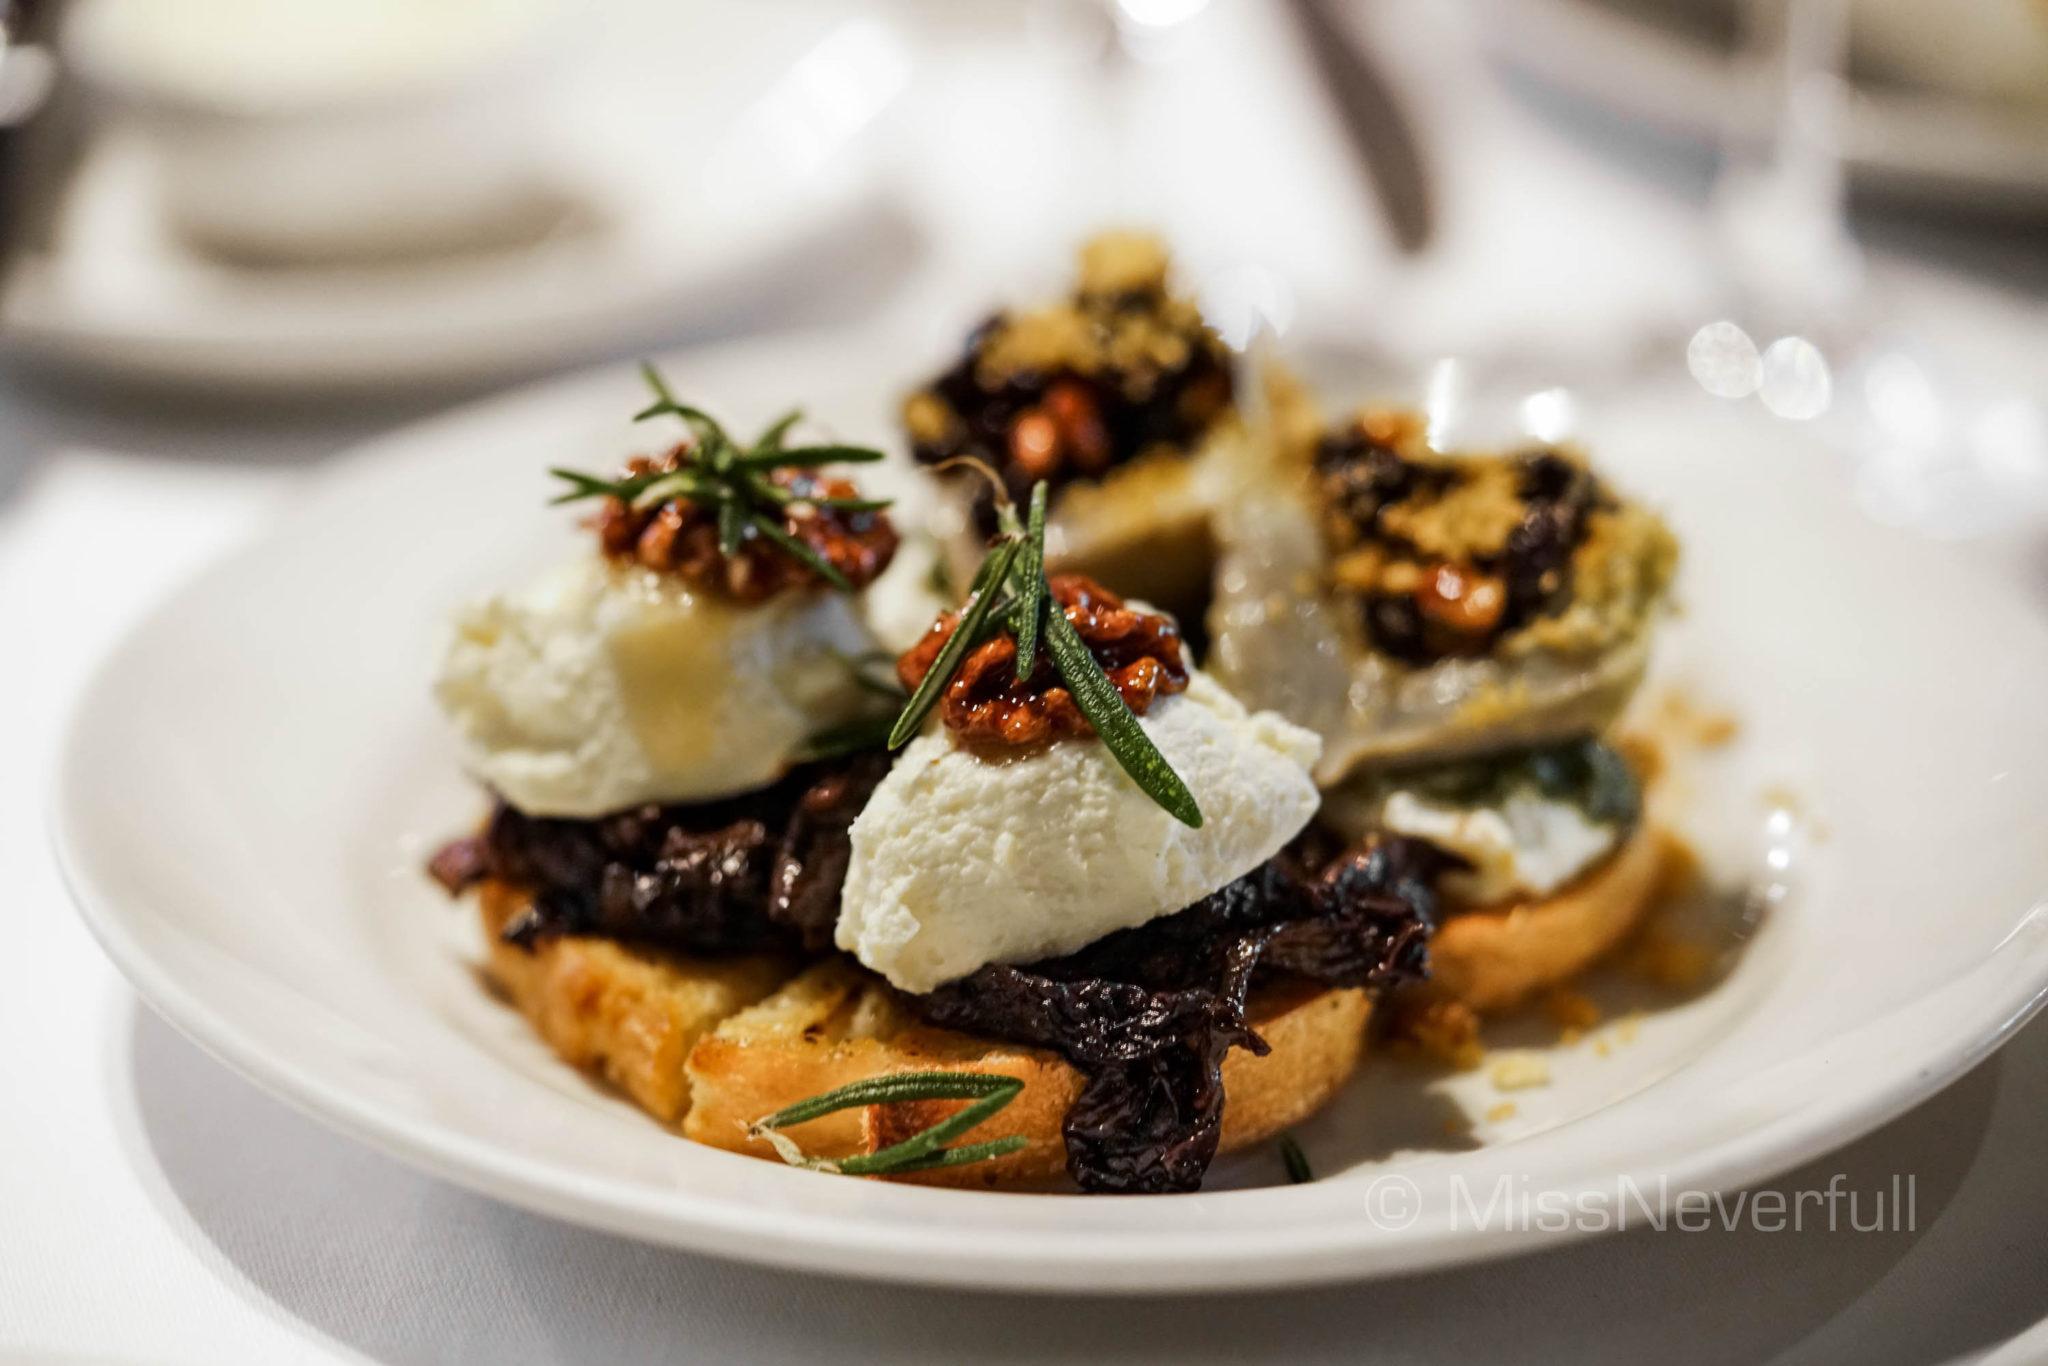 Ricotta and burrata cheese